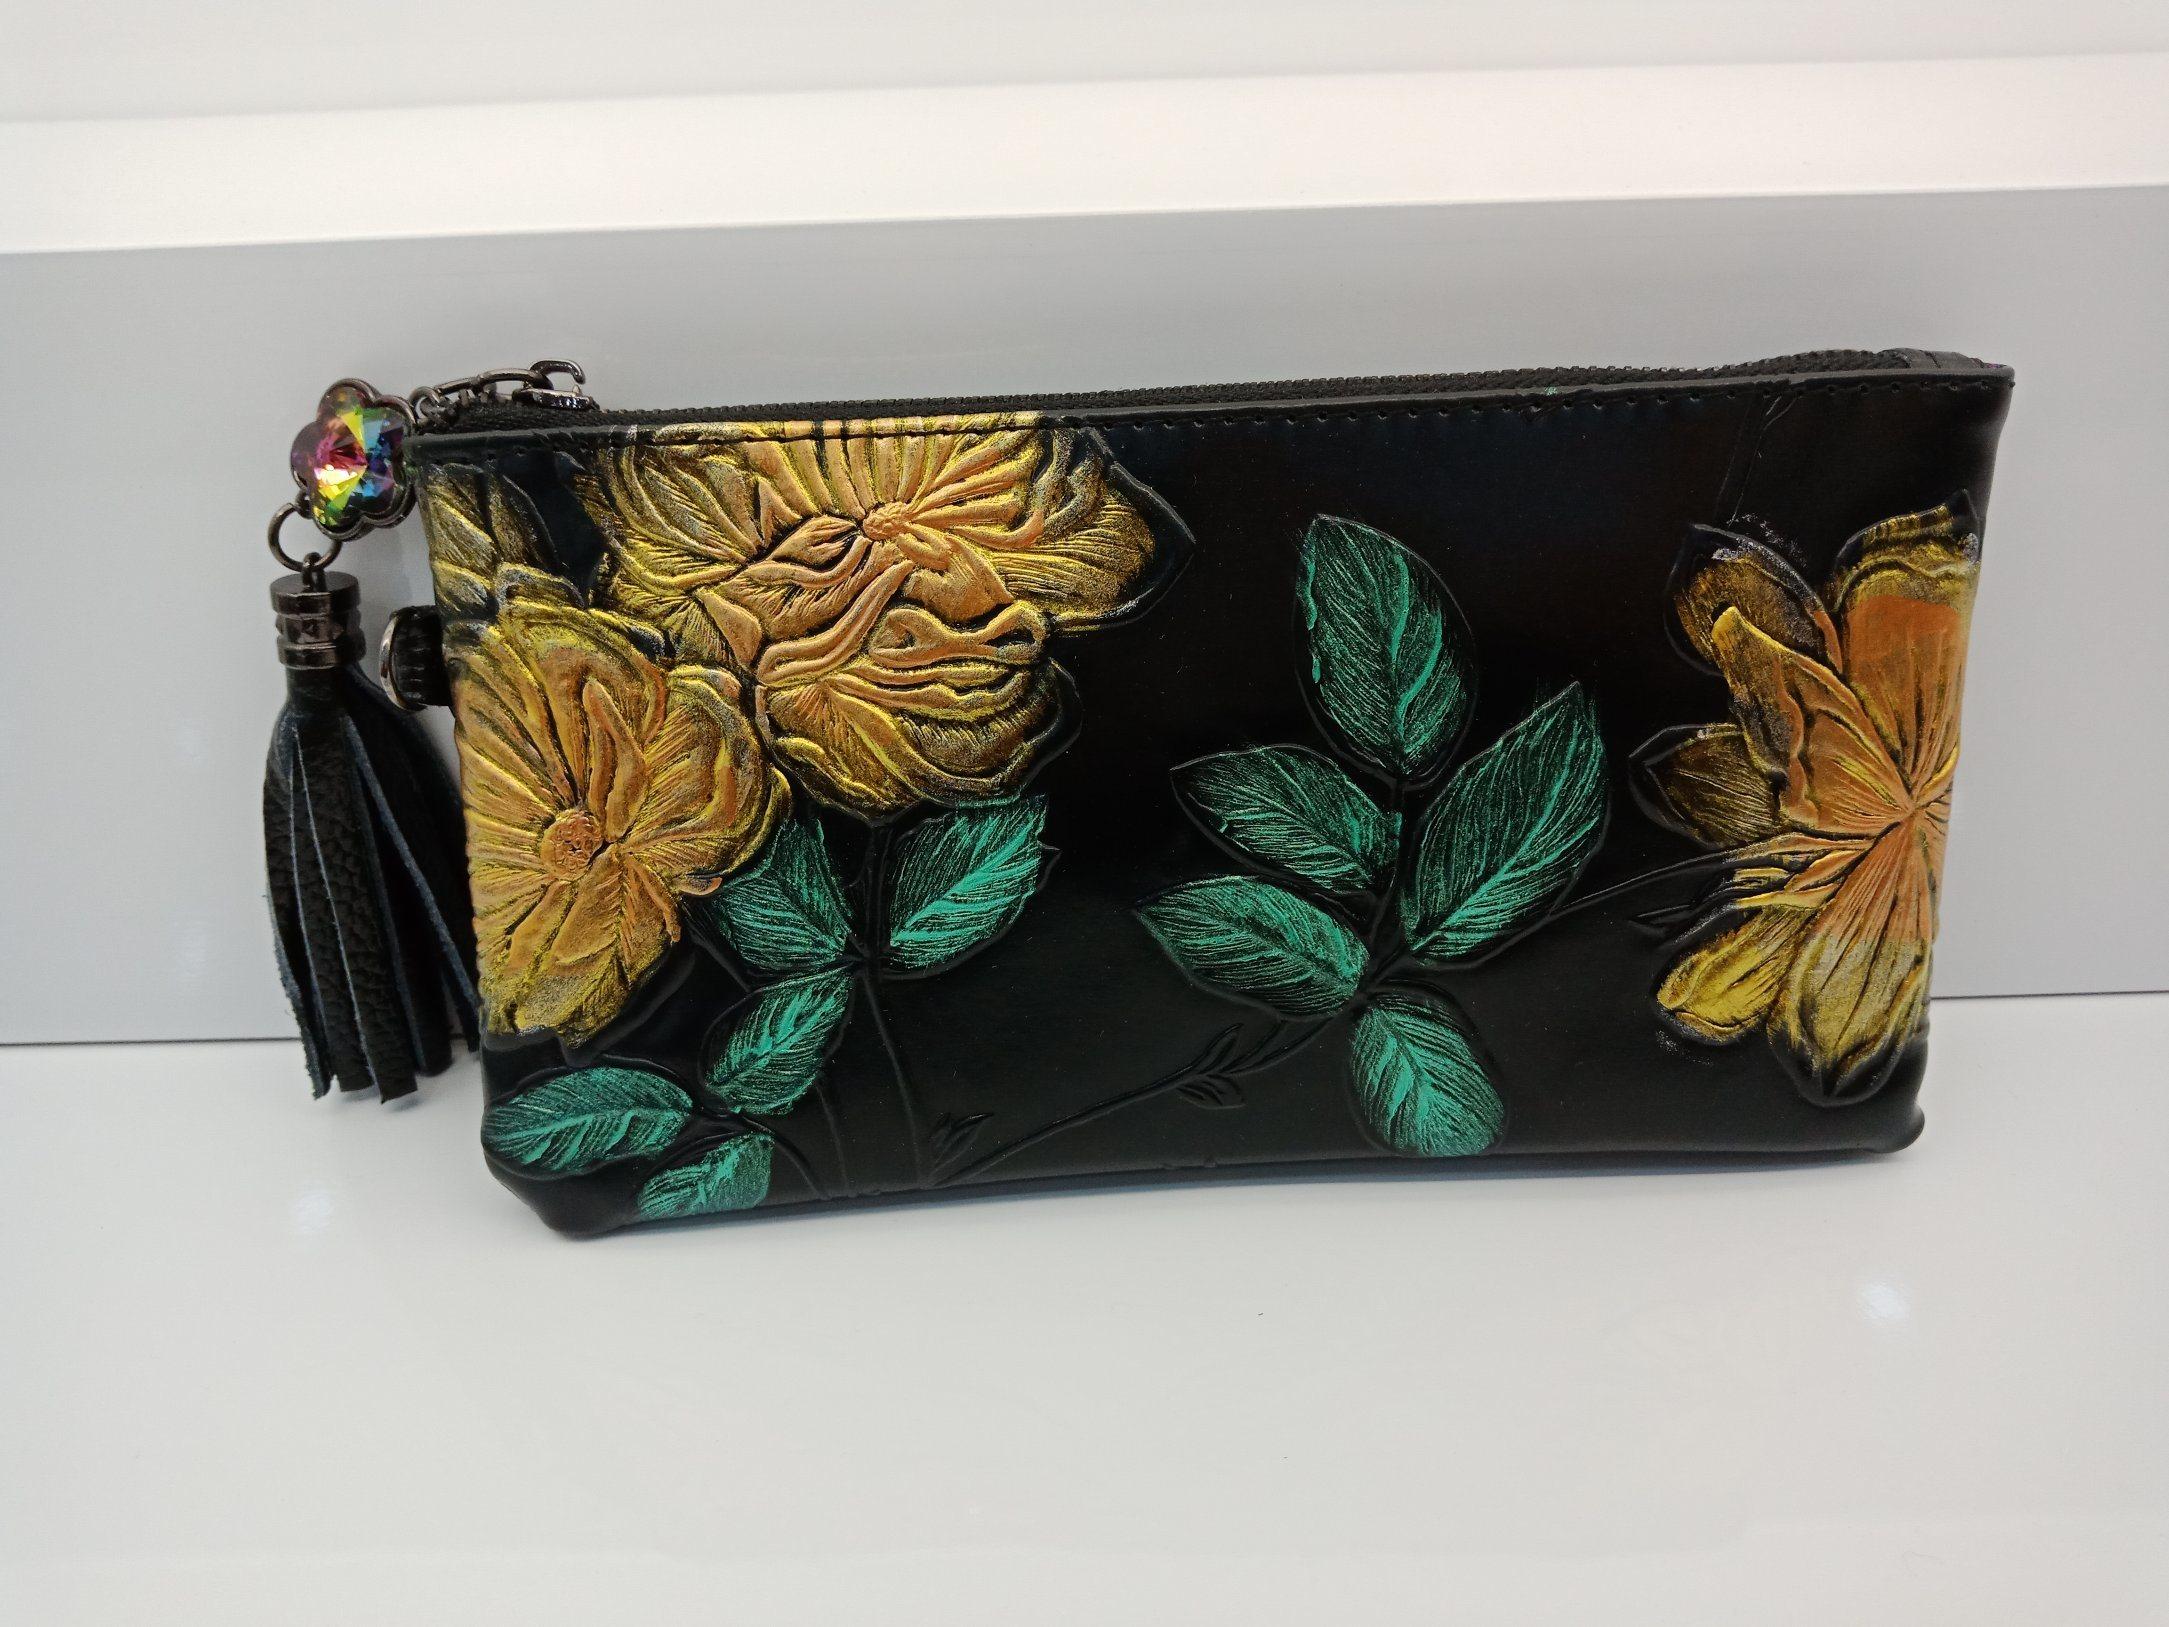 China Genuine Leather Lady Clutch Women Bag Crossbody Promotional Bags Gold Ladies Handbag Wdl0419 Shoulder